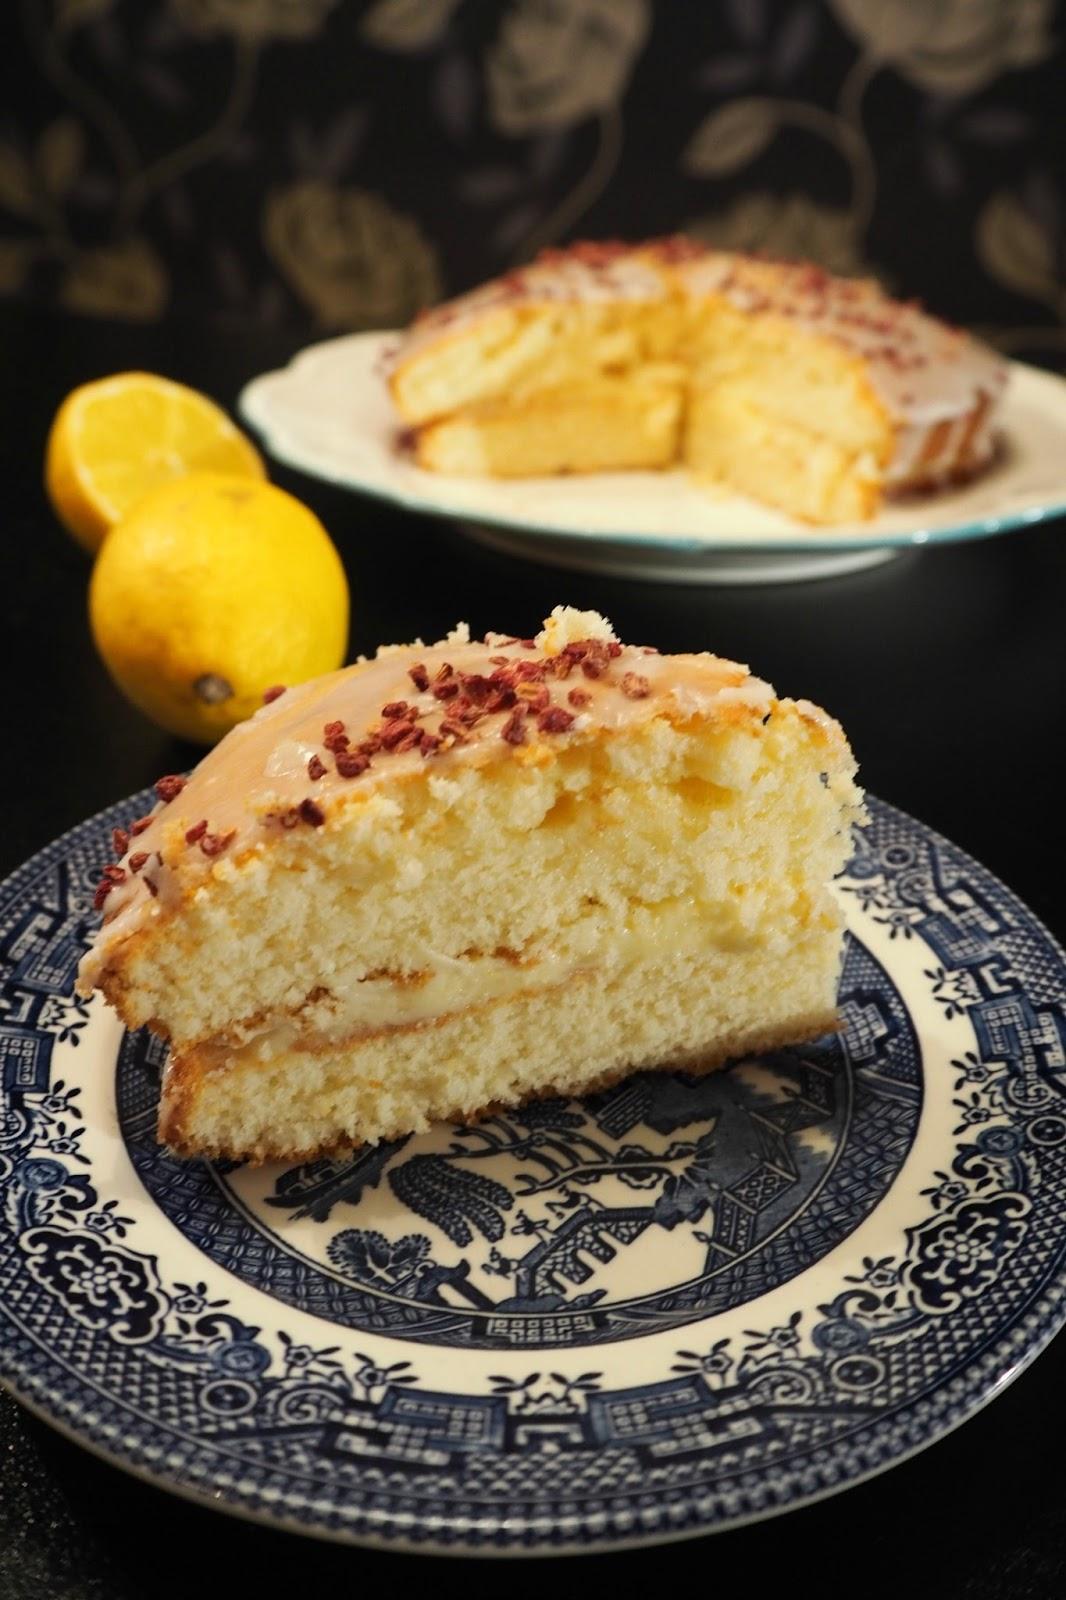 Homemade lemon drizzle cake